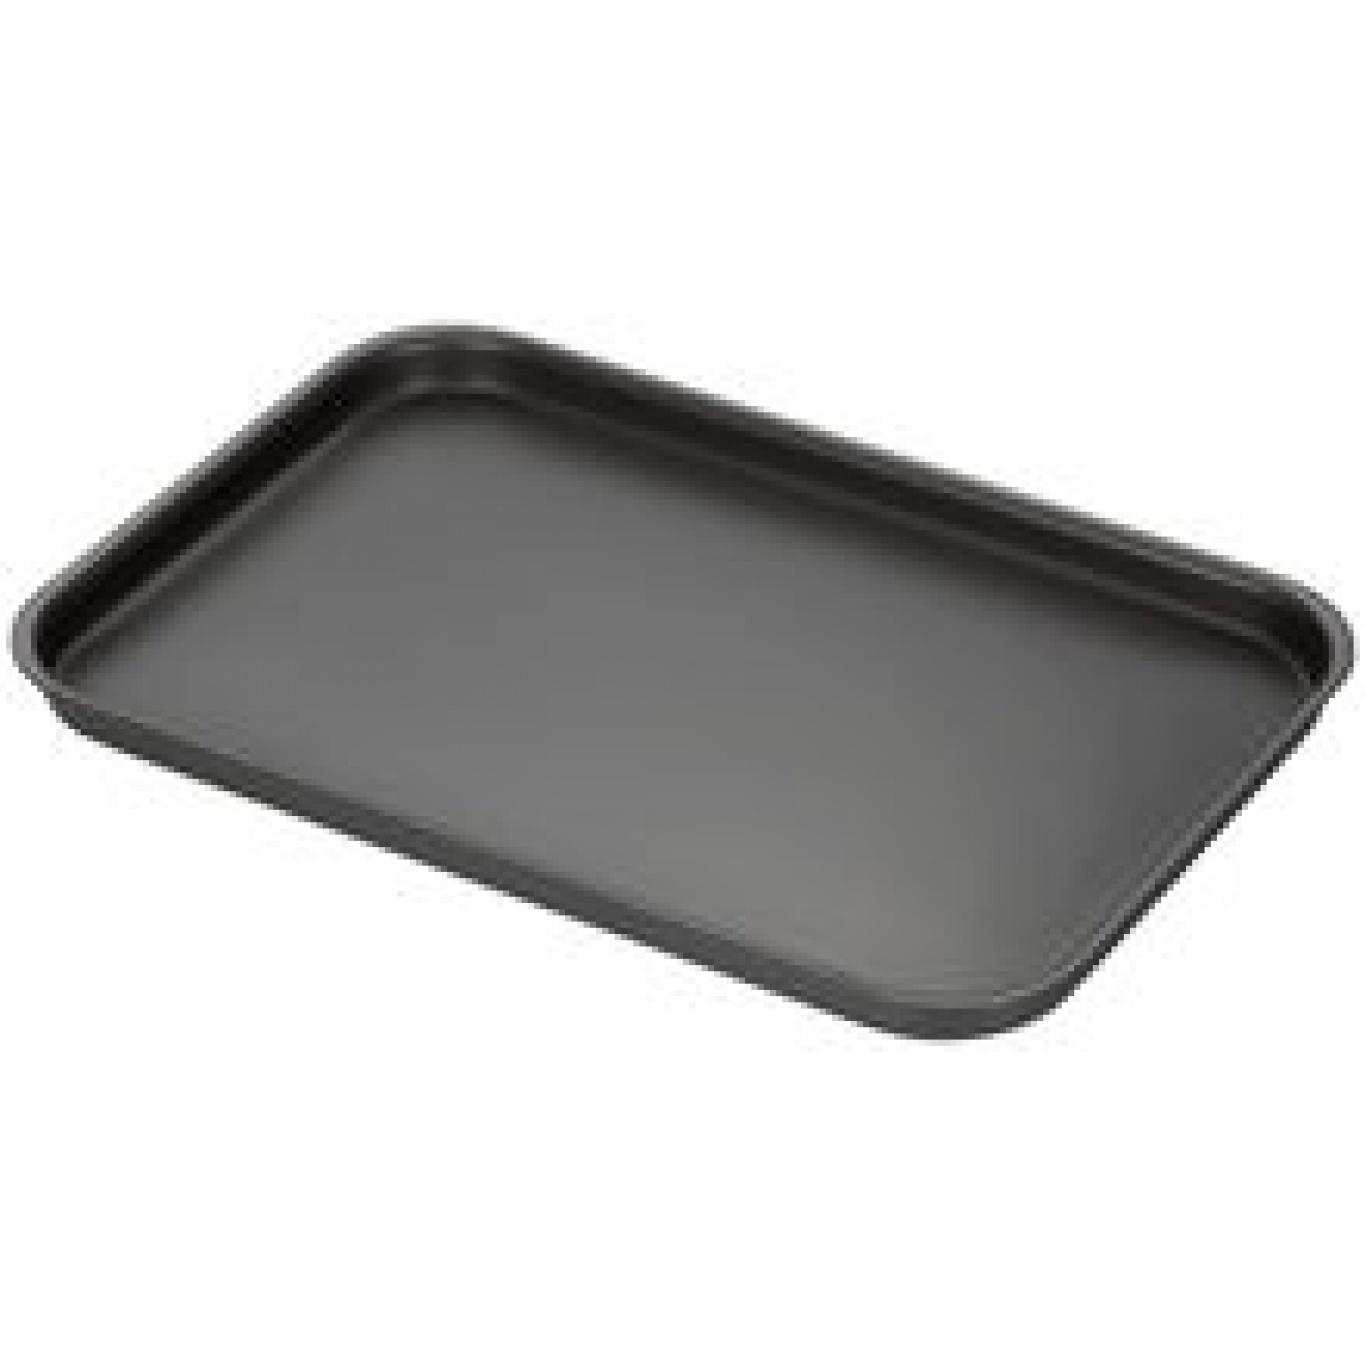 Image of Stellar Hard Anodised Baking Tray 30 x 20 x 1.5cm